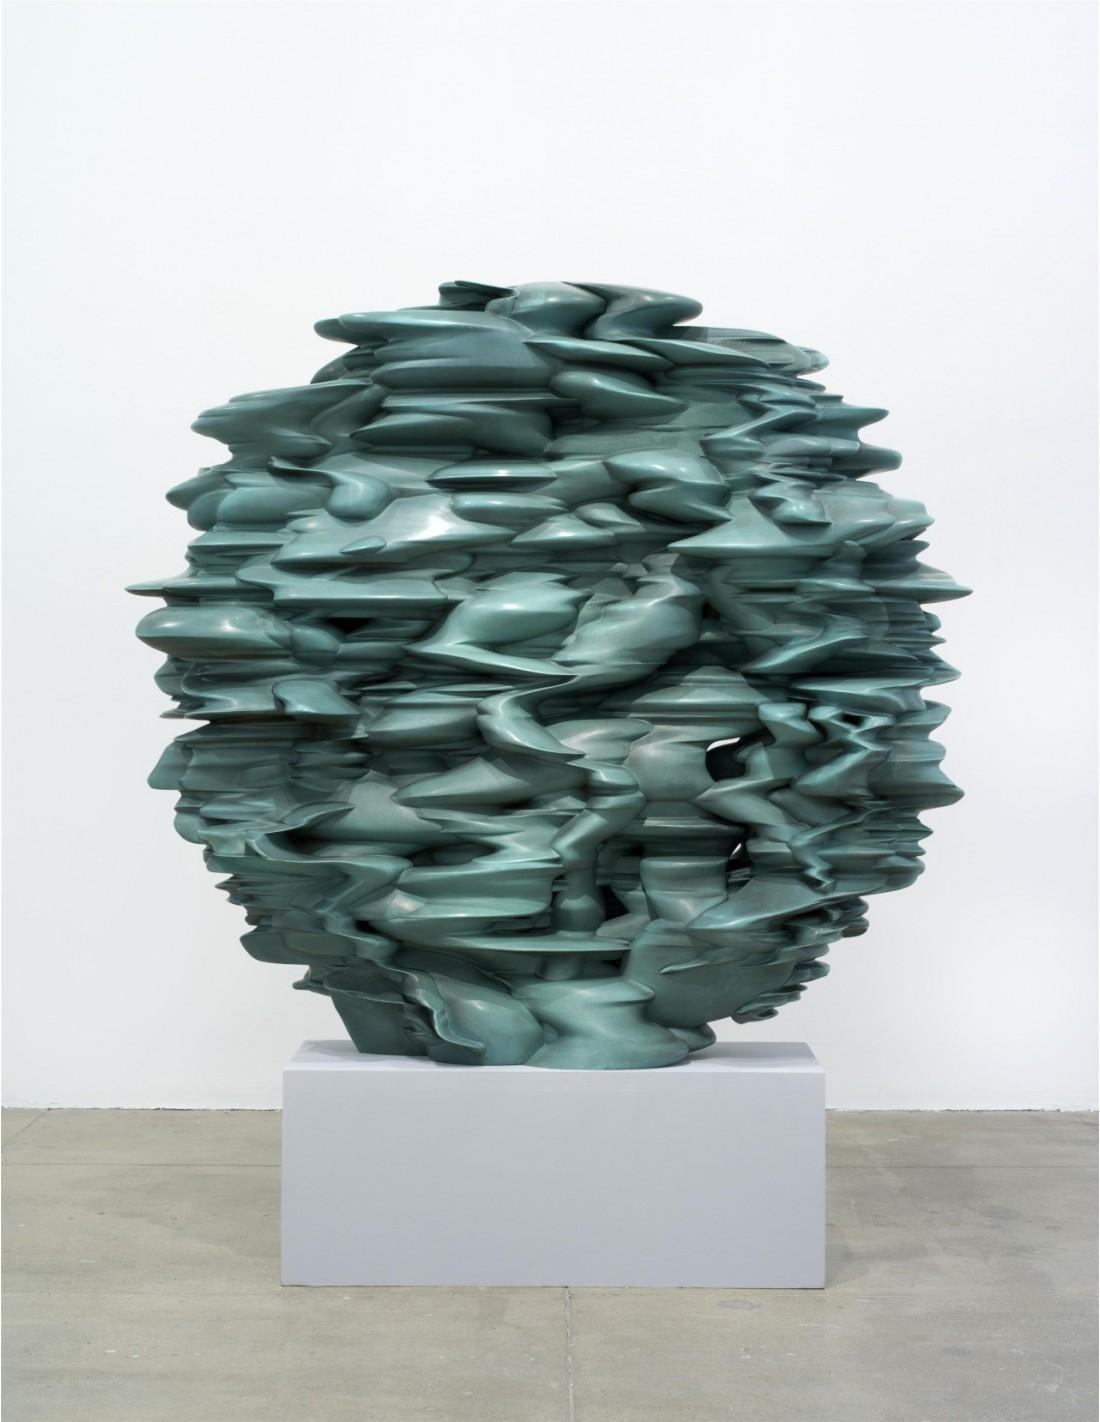 Exhibition Display Plinths : Tony cragg lisson gallery artplinths